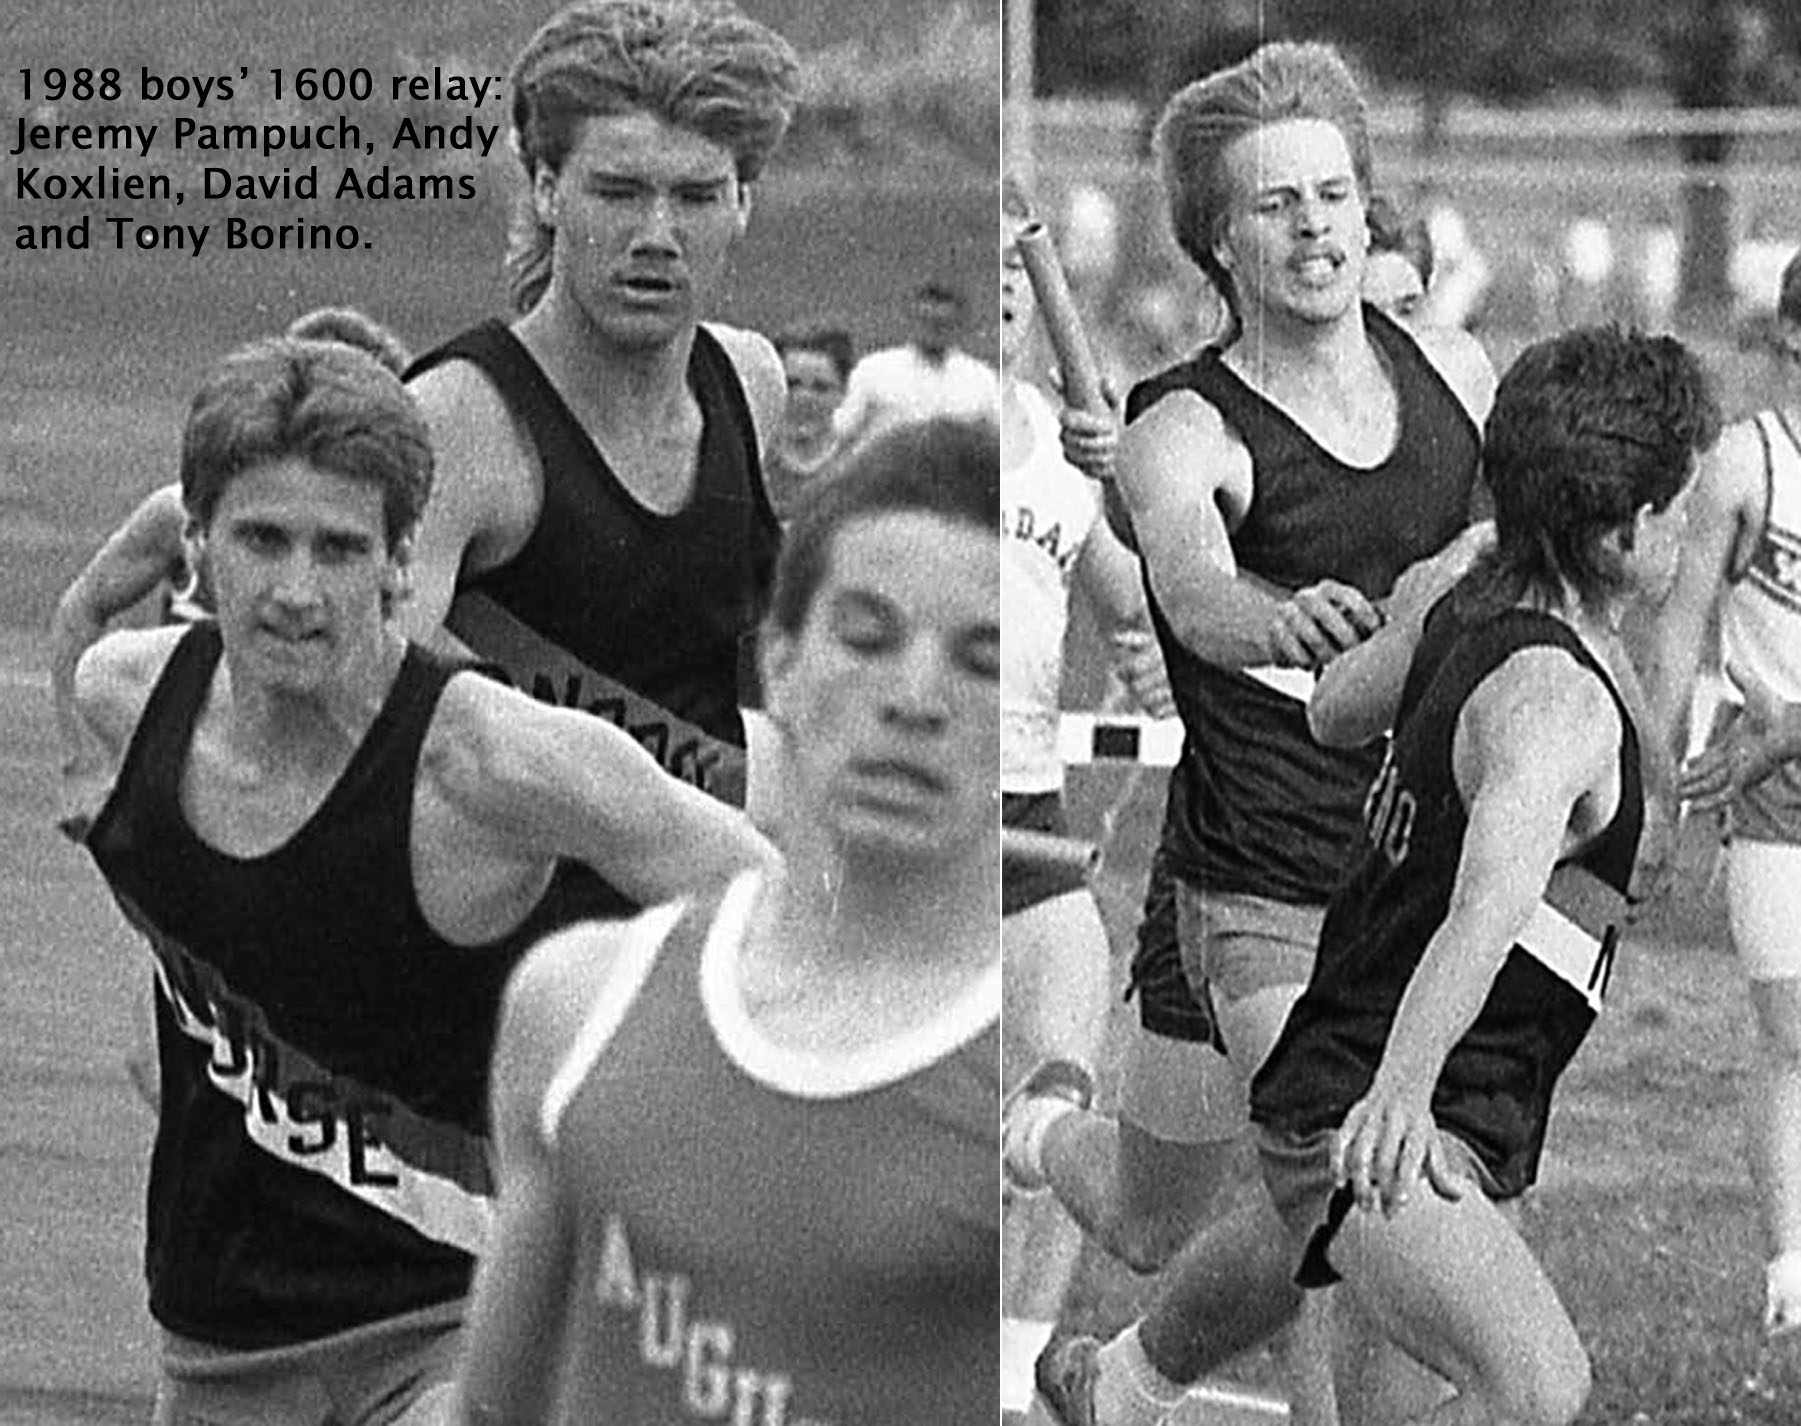 1988 1600 relay.jpg